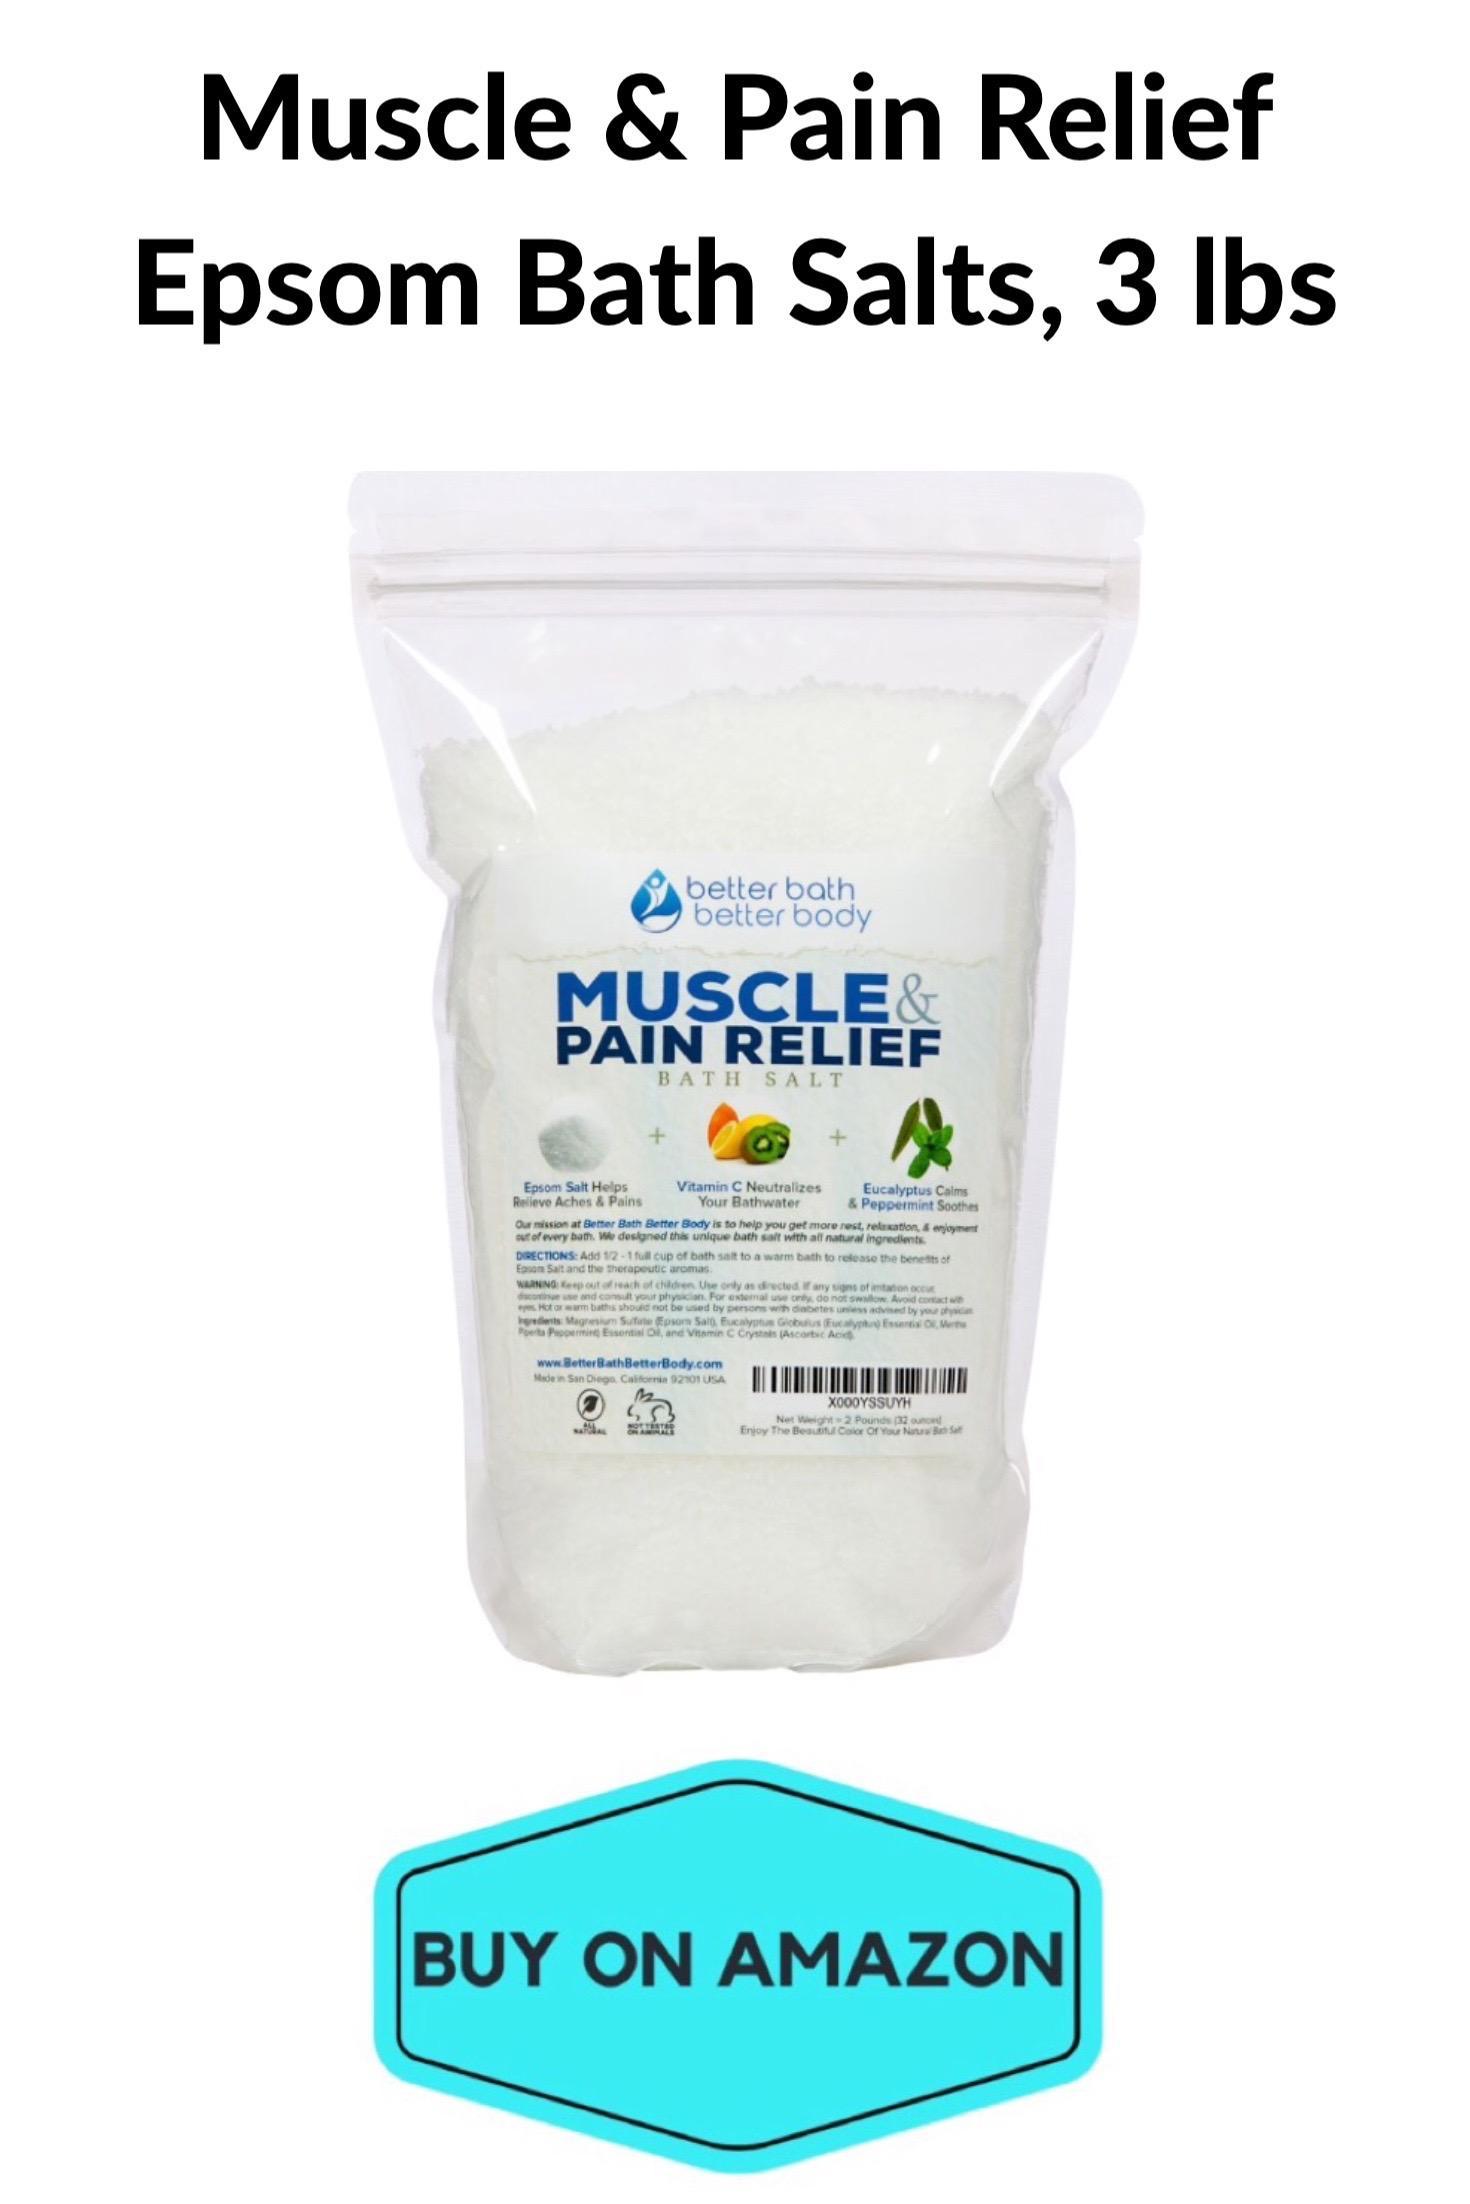 Muscle & Pain Relief Epsom Bath Salts